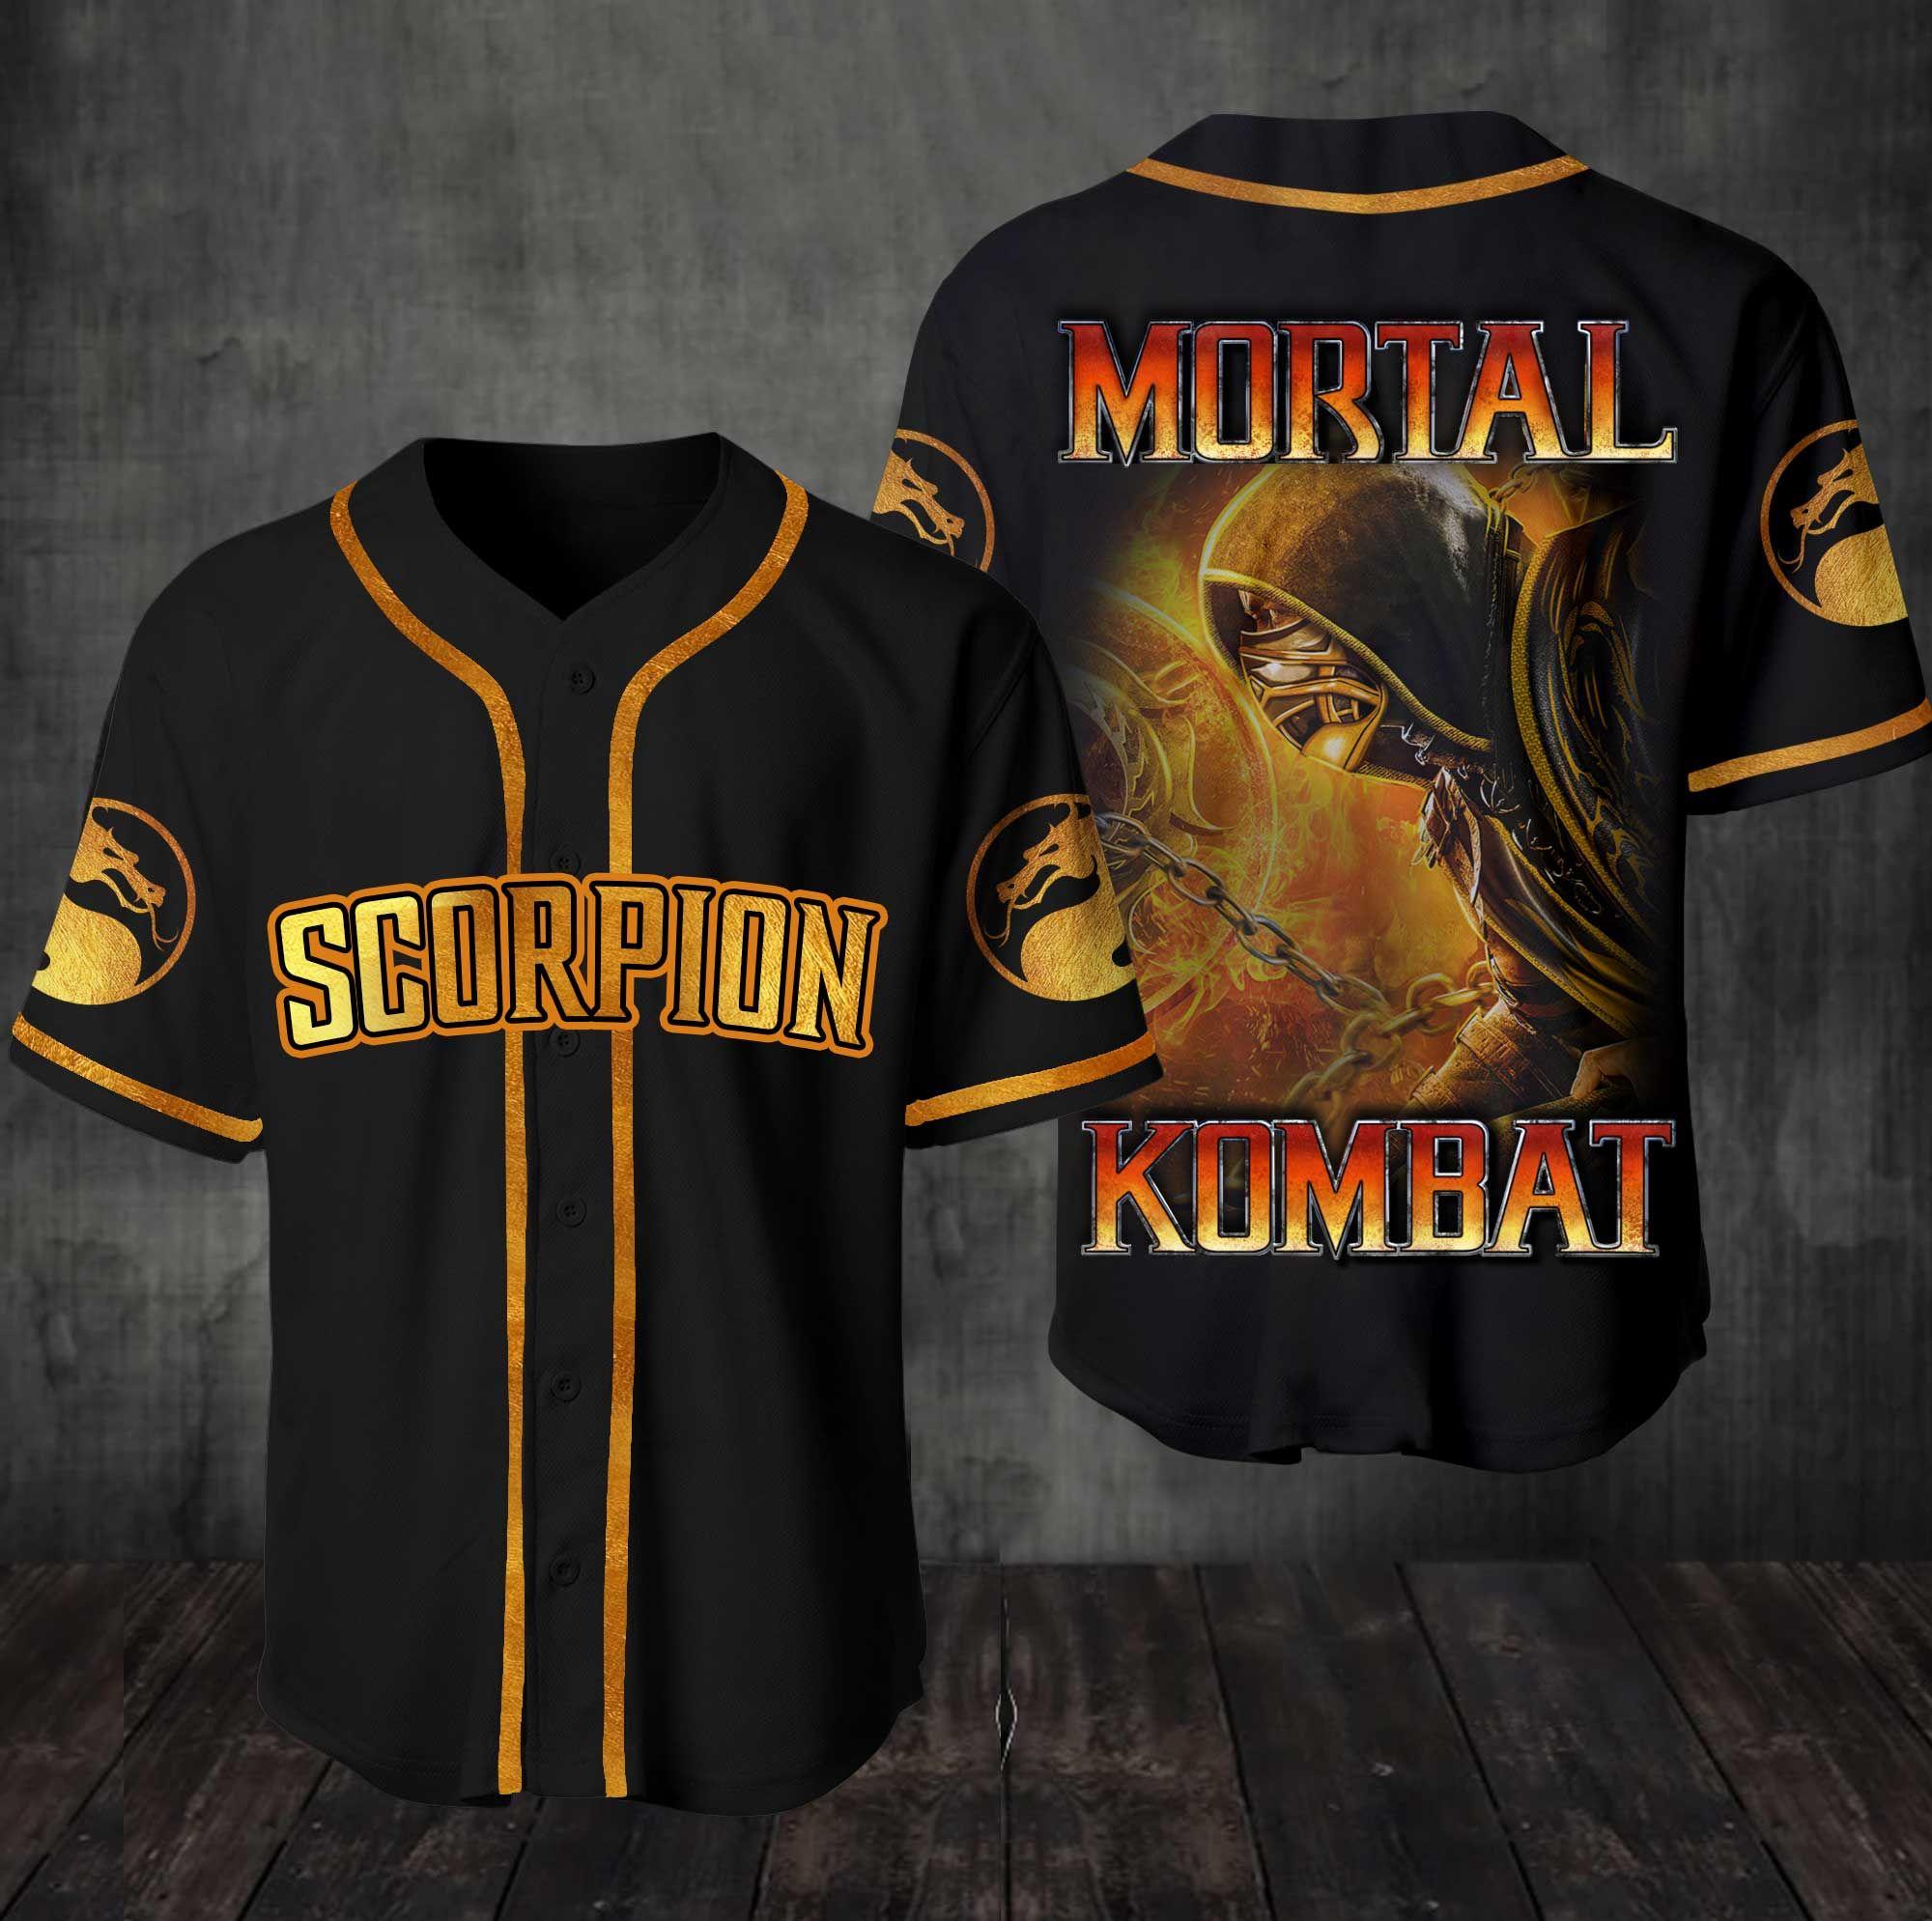 Mortal Kombat Team Scorpion Baseball Jersey Shirt